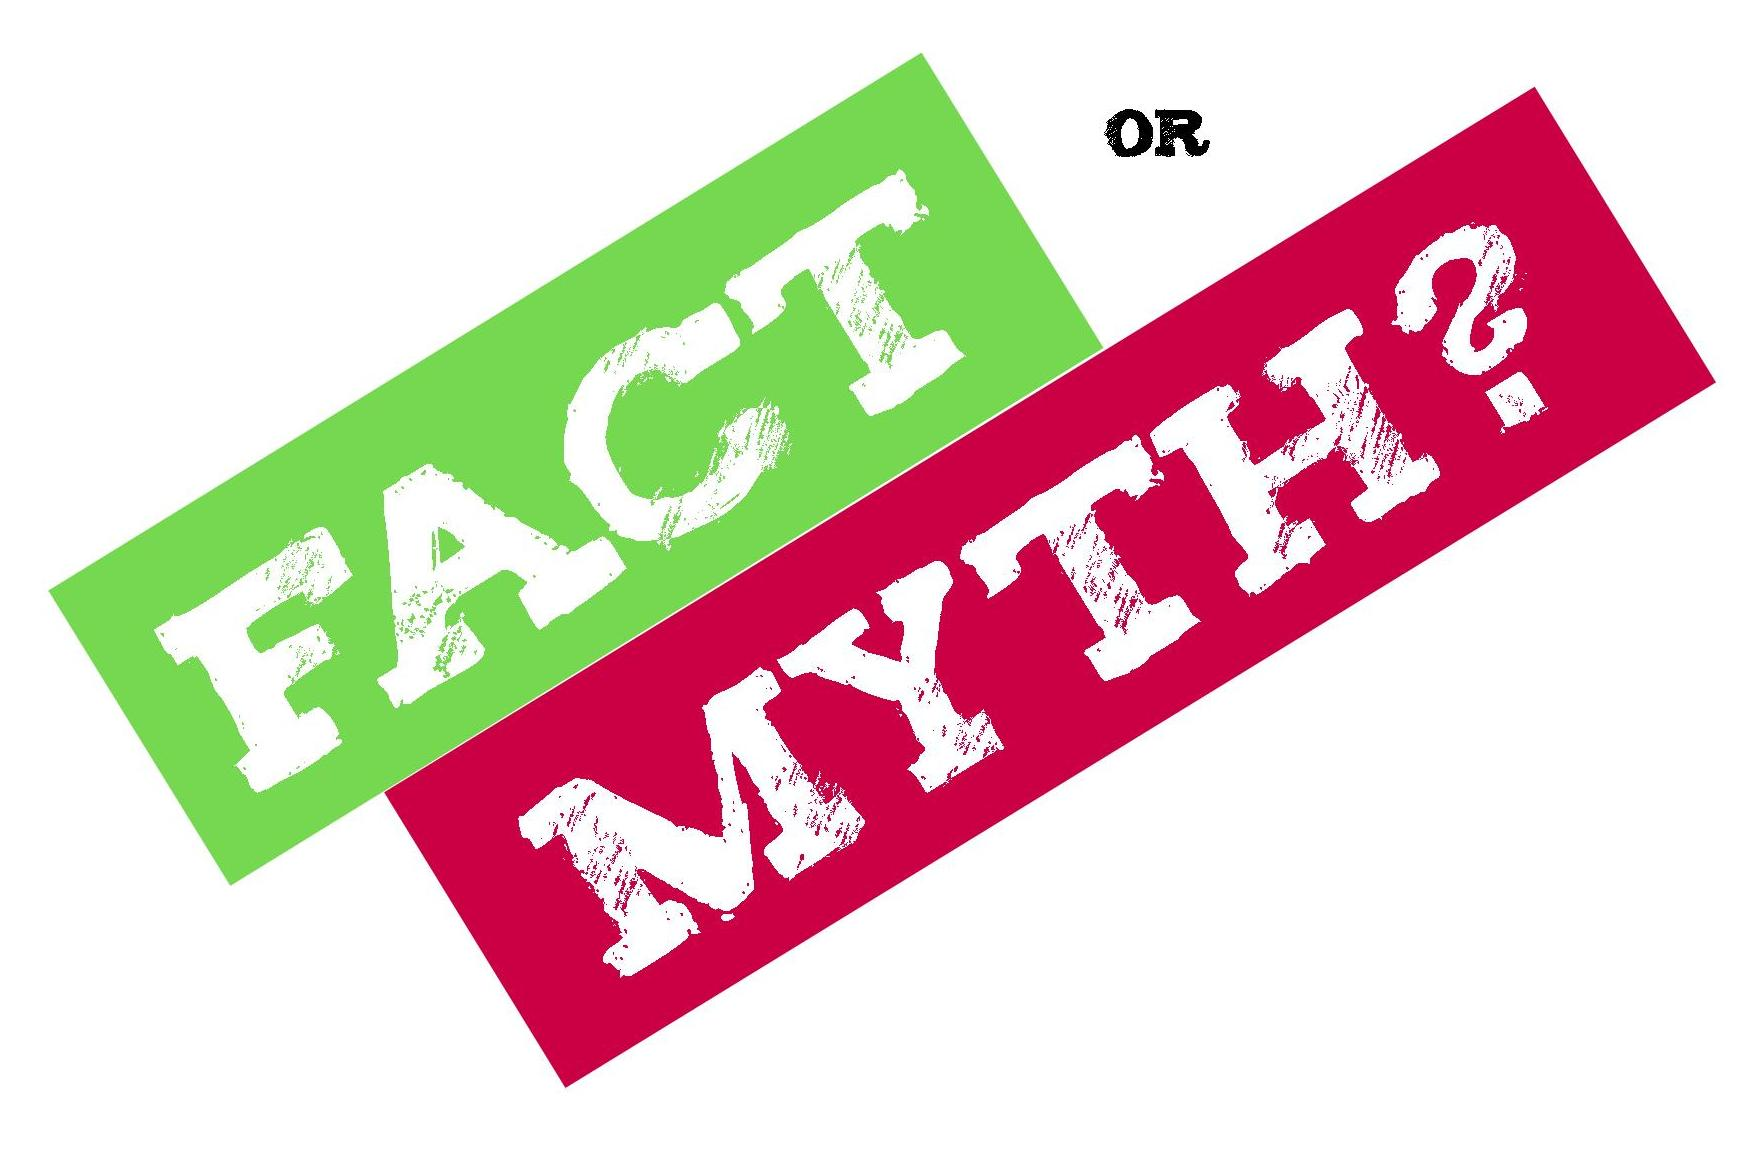 http://liveandletdyehair.com/wp-content/uploads/2015/03/myths2.jpg